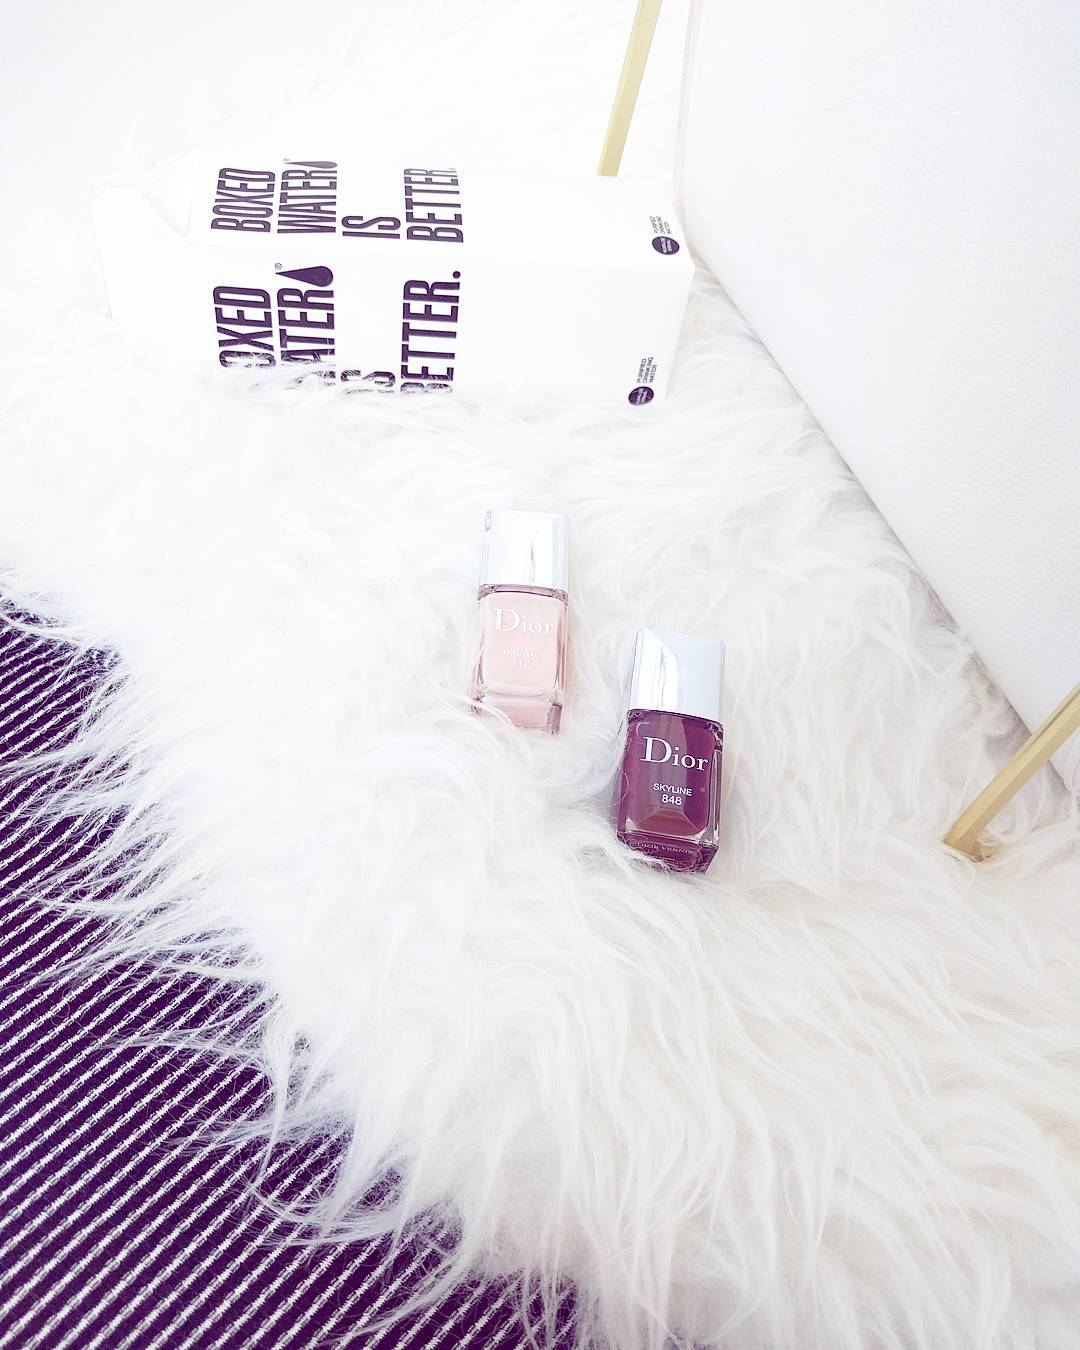 Dior Skyline nail polishes